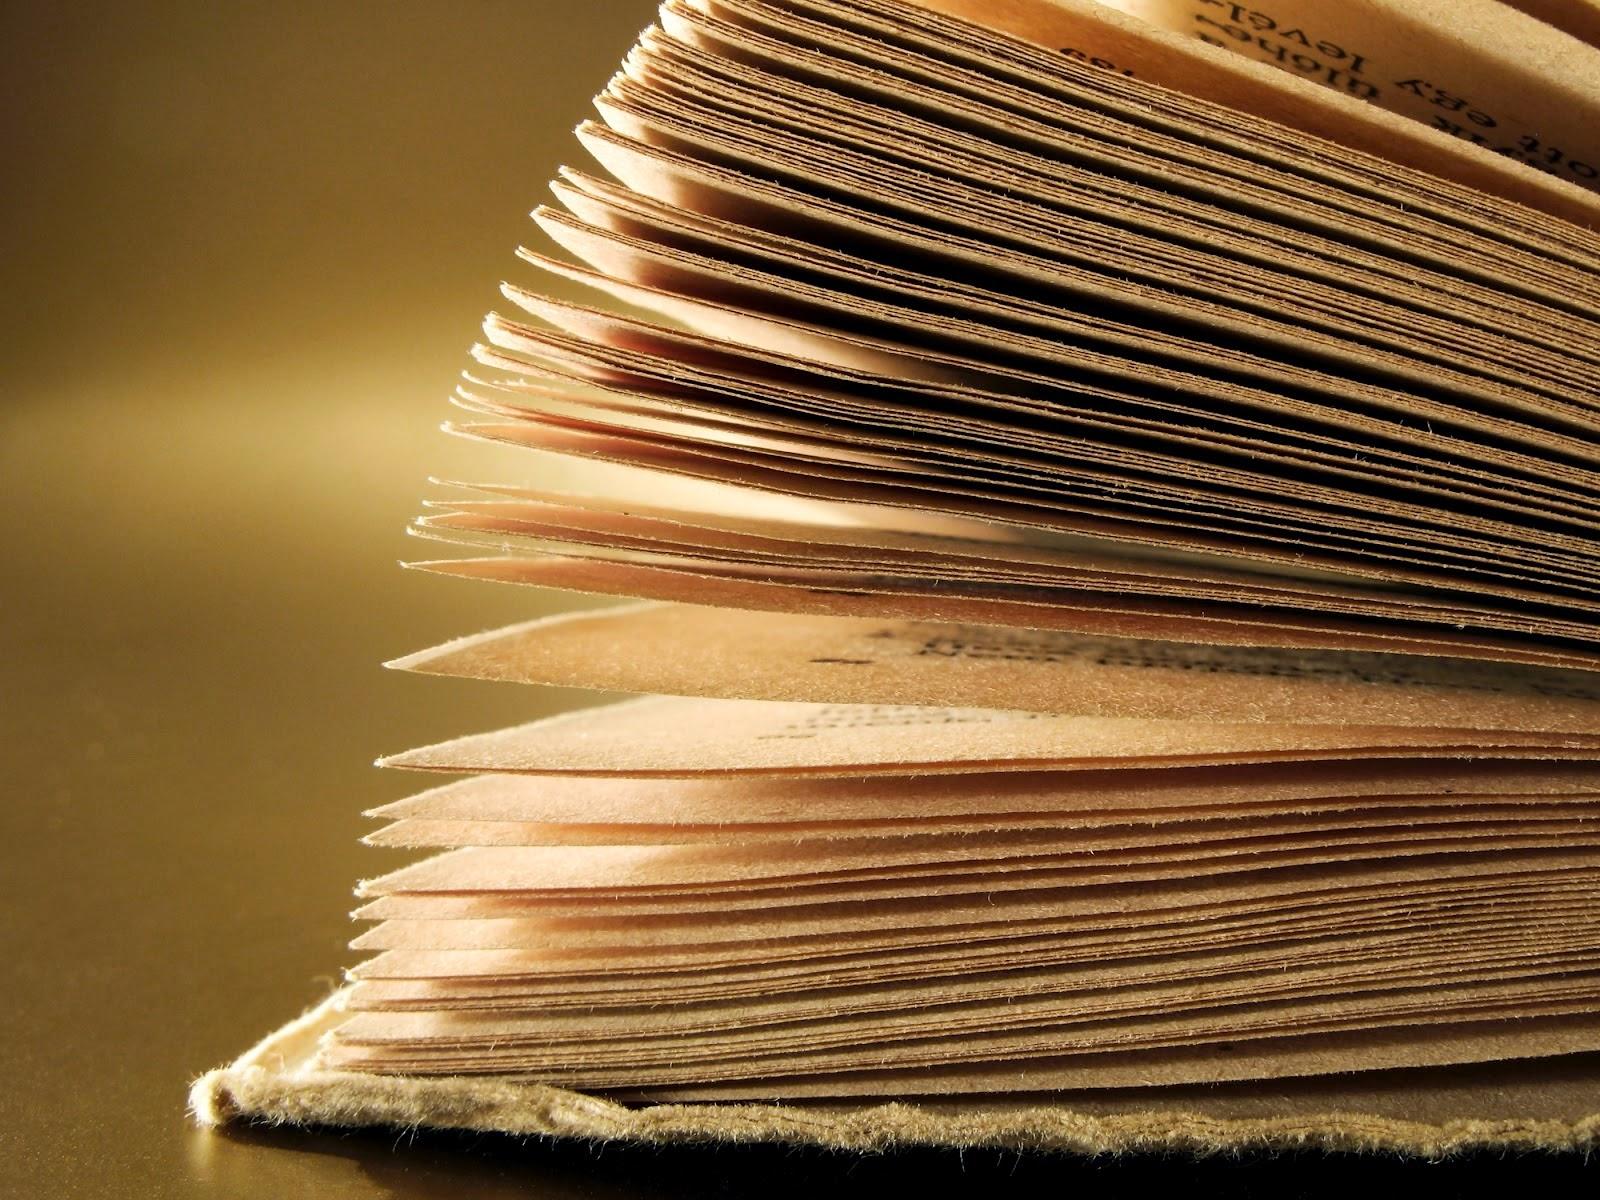 Libros en papel y algún e-book